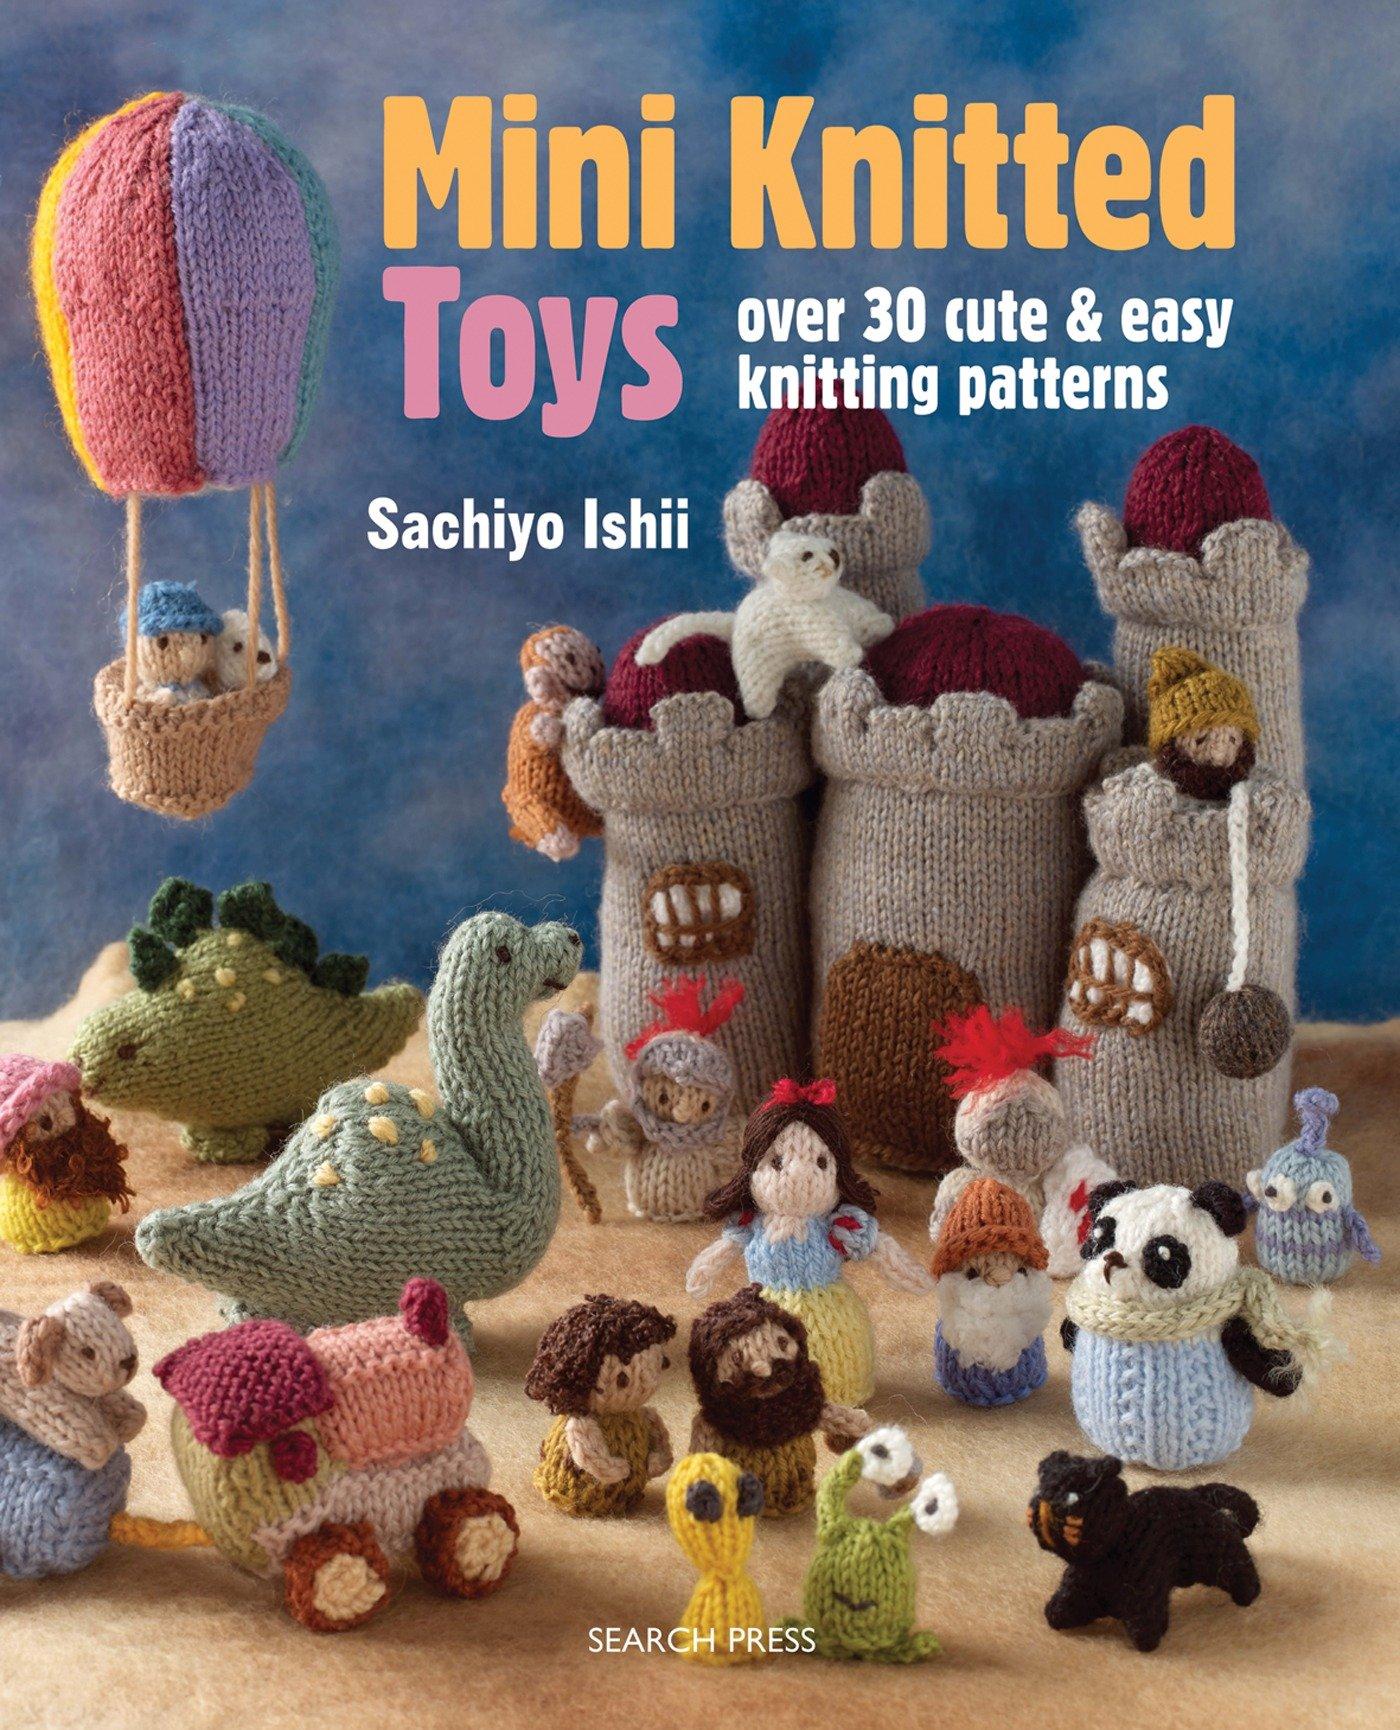 mini knitted toys: over 30 cute u0026 easy knitting patterns: sachiyo ishii: jedpowb